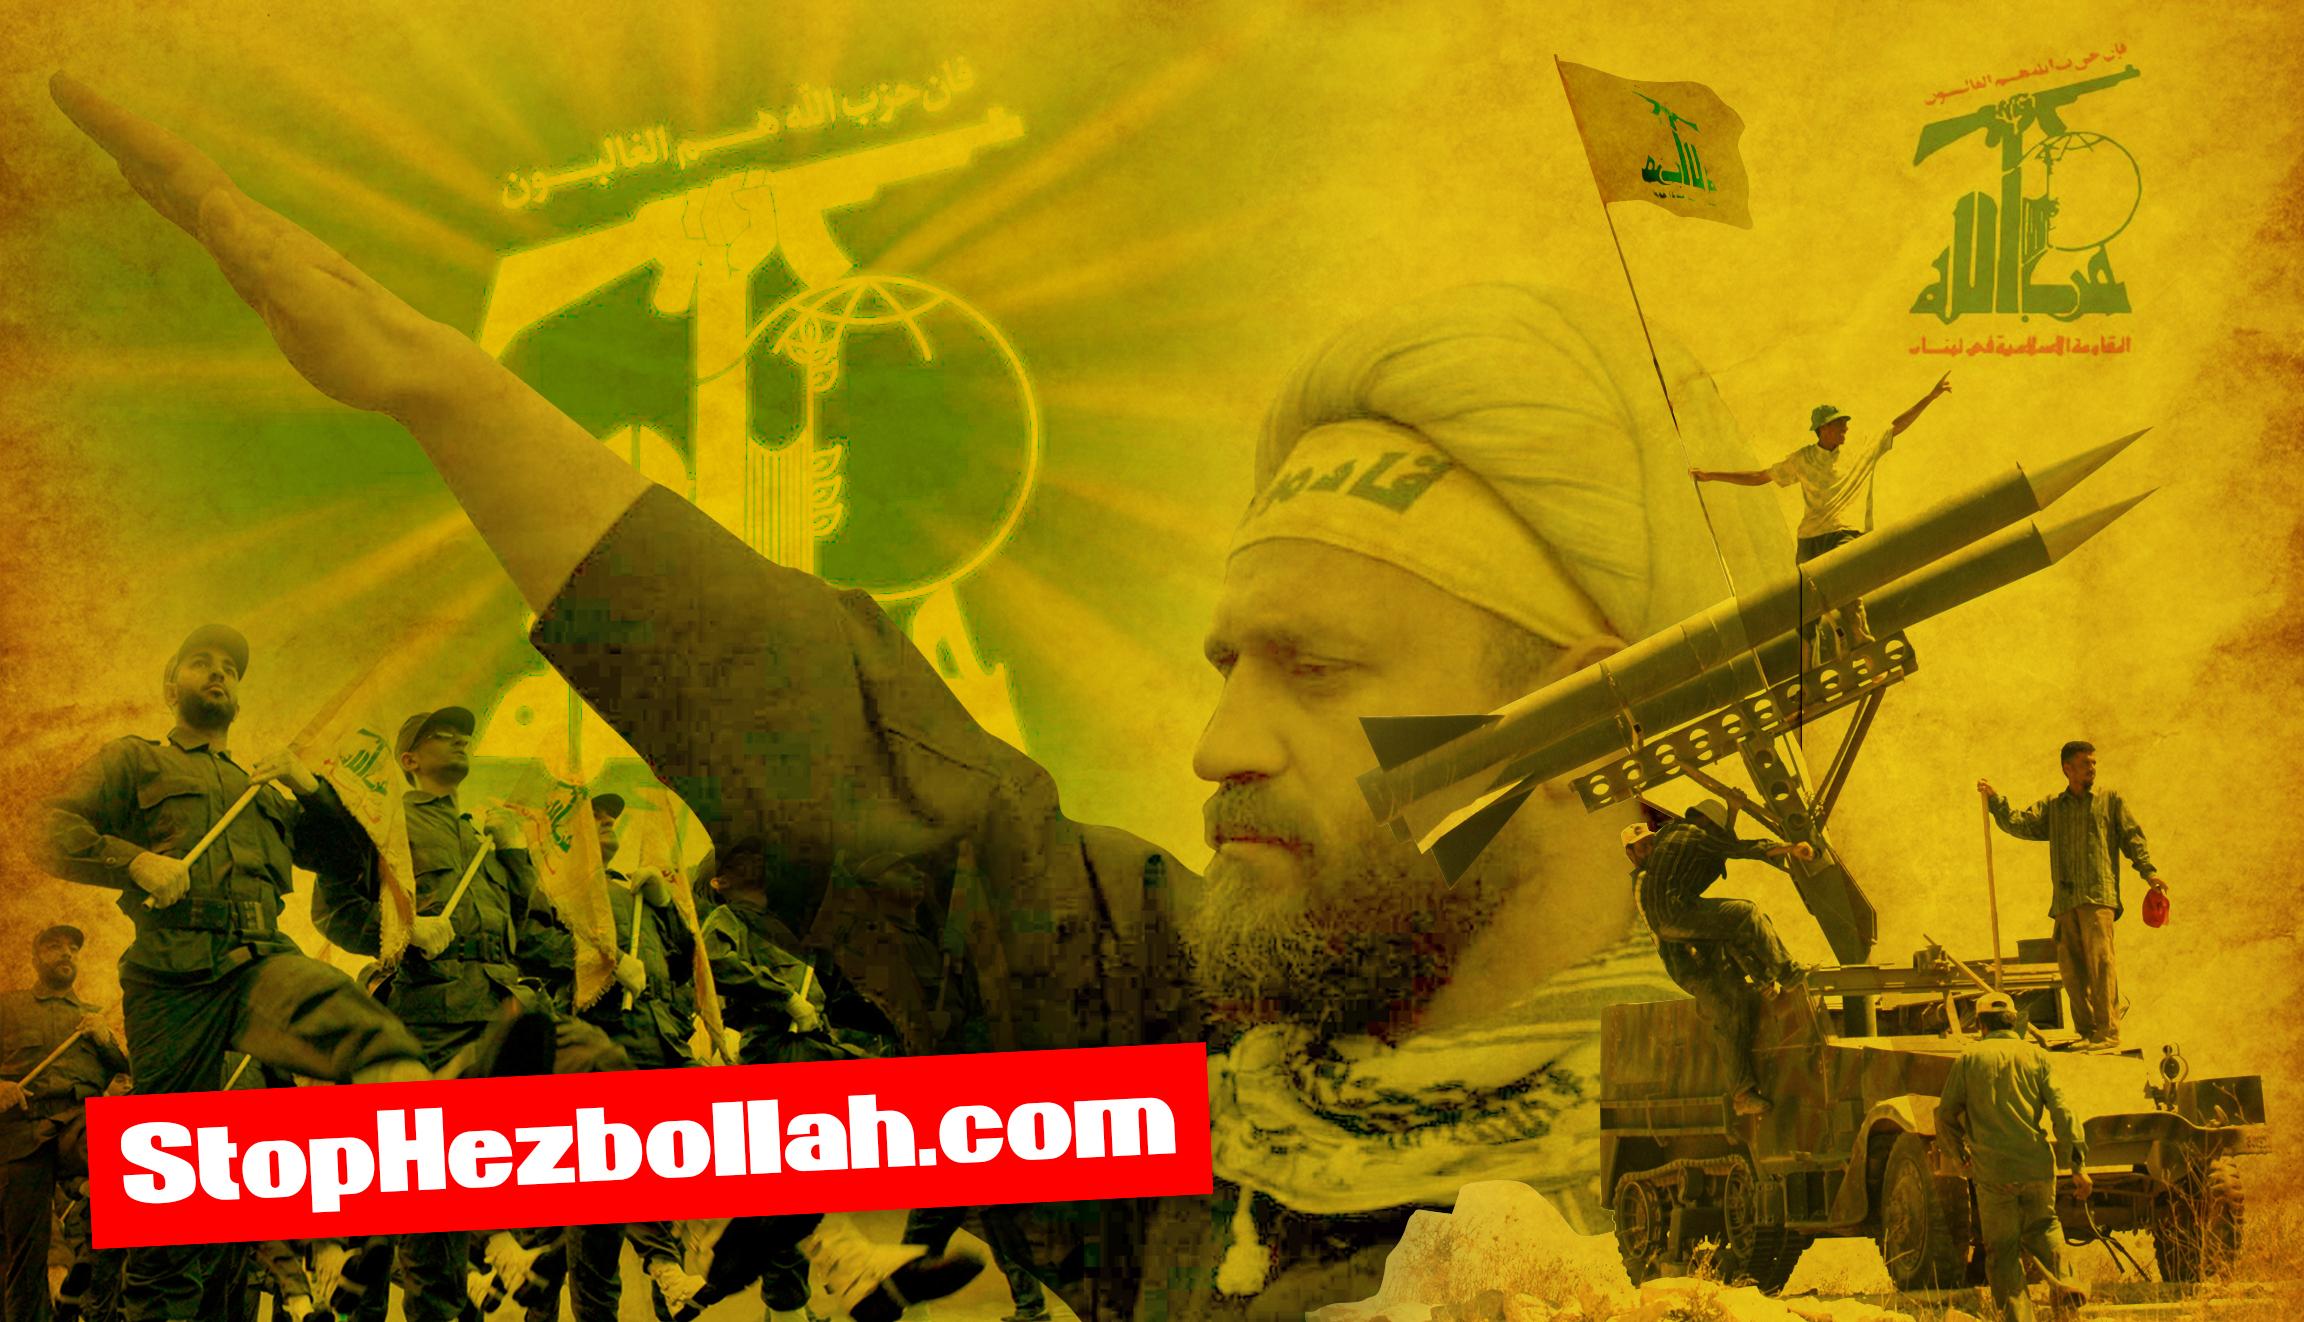 stop_hezbollah2.jpg